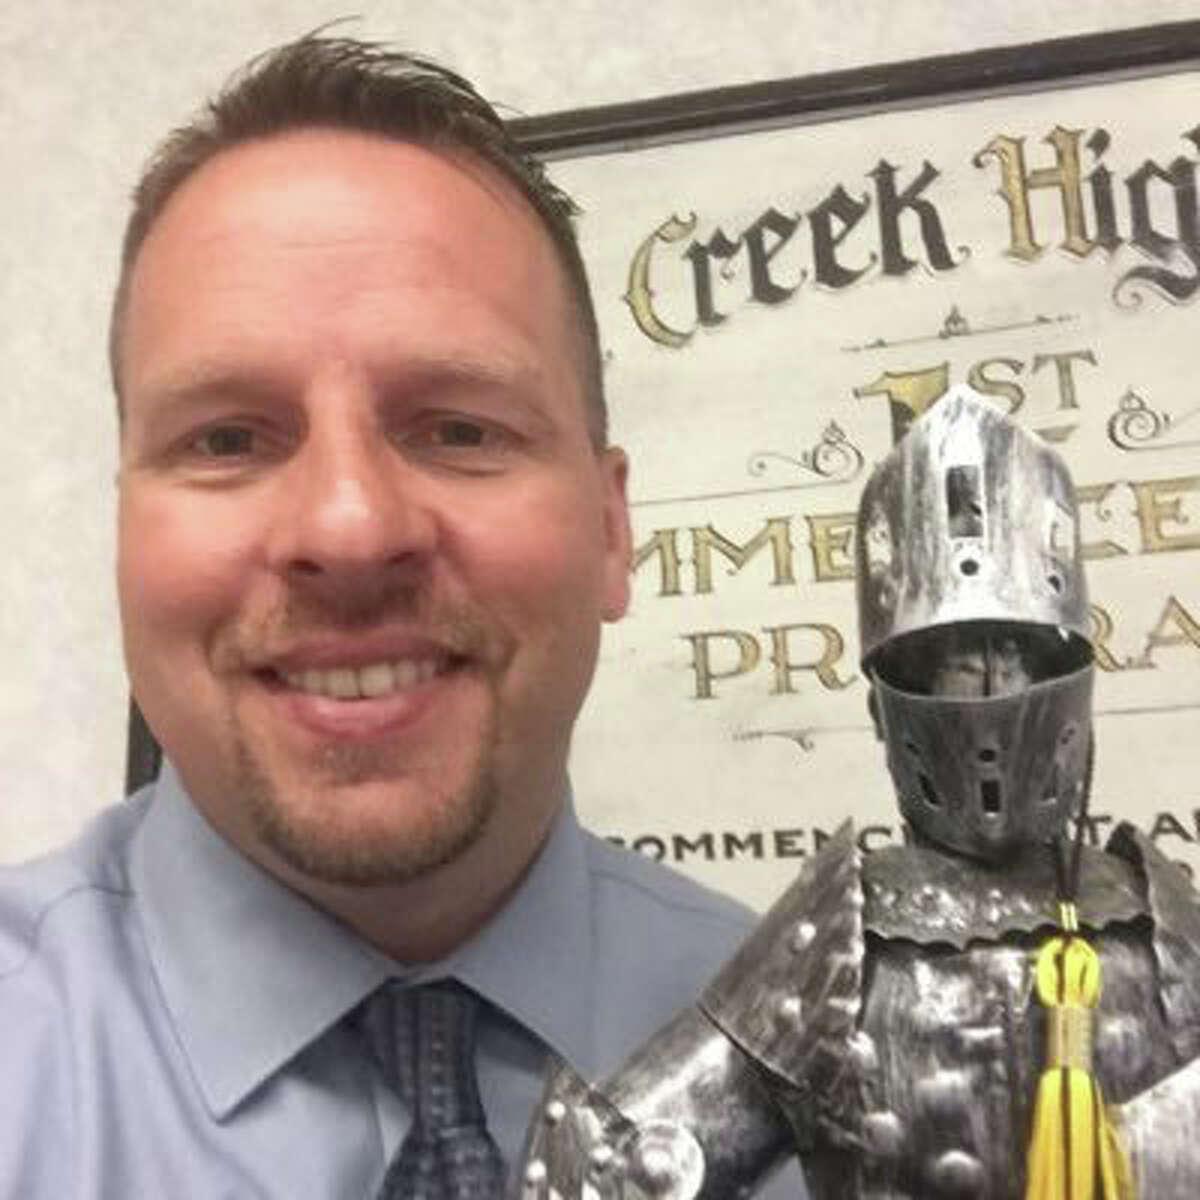 Bullock Creek Schools Superintendent Shawn Hale